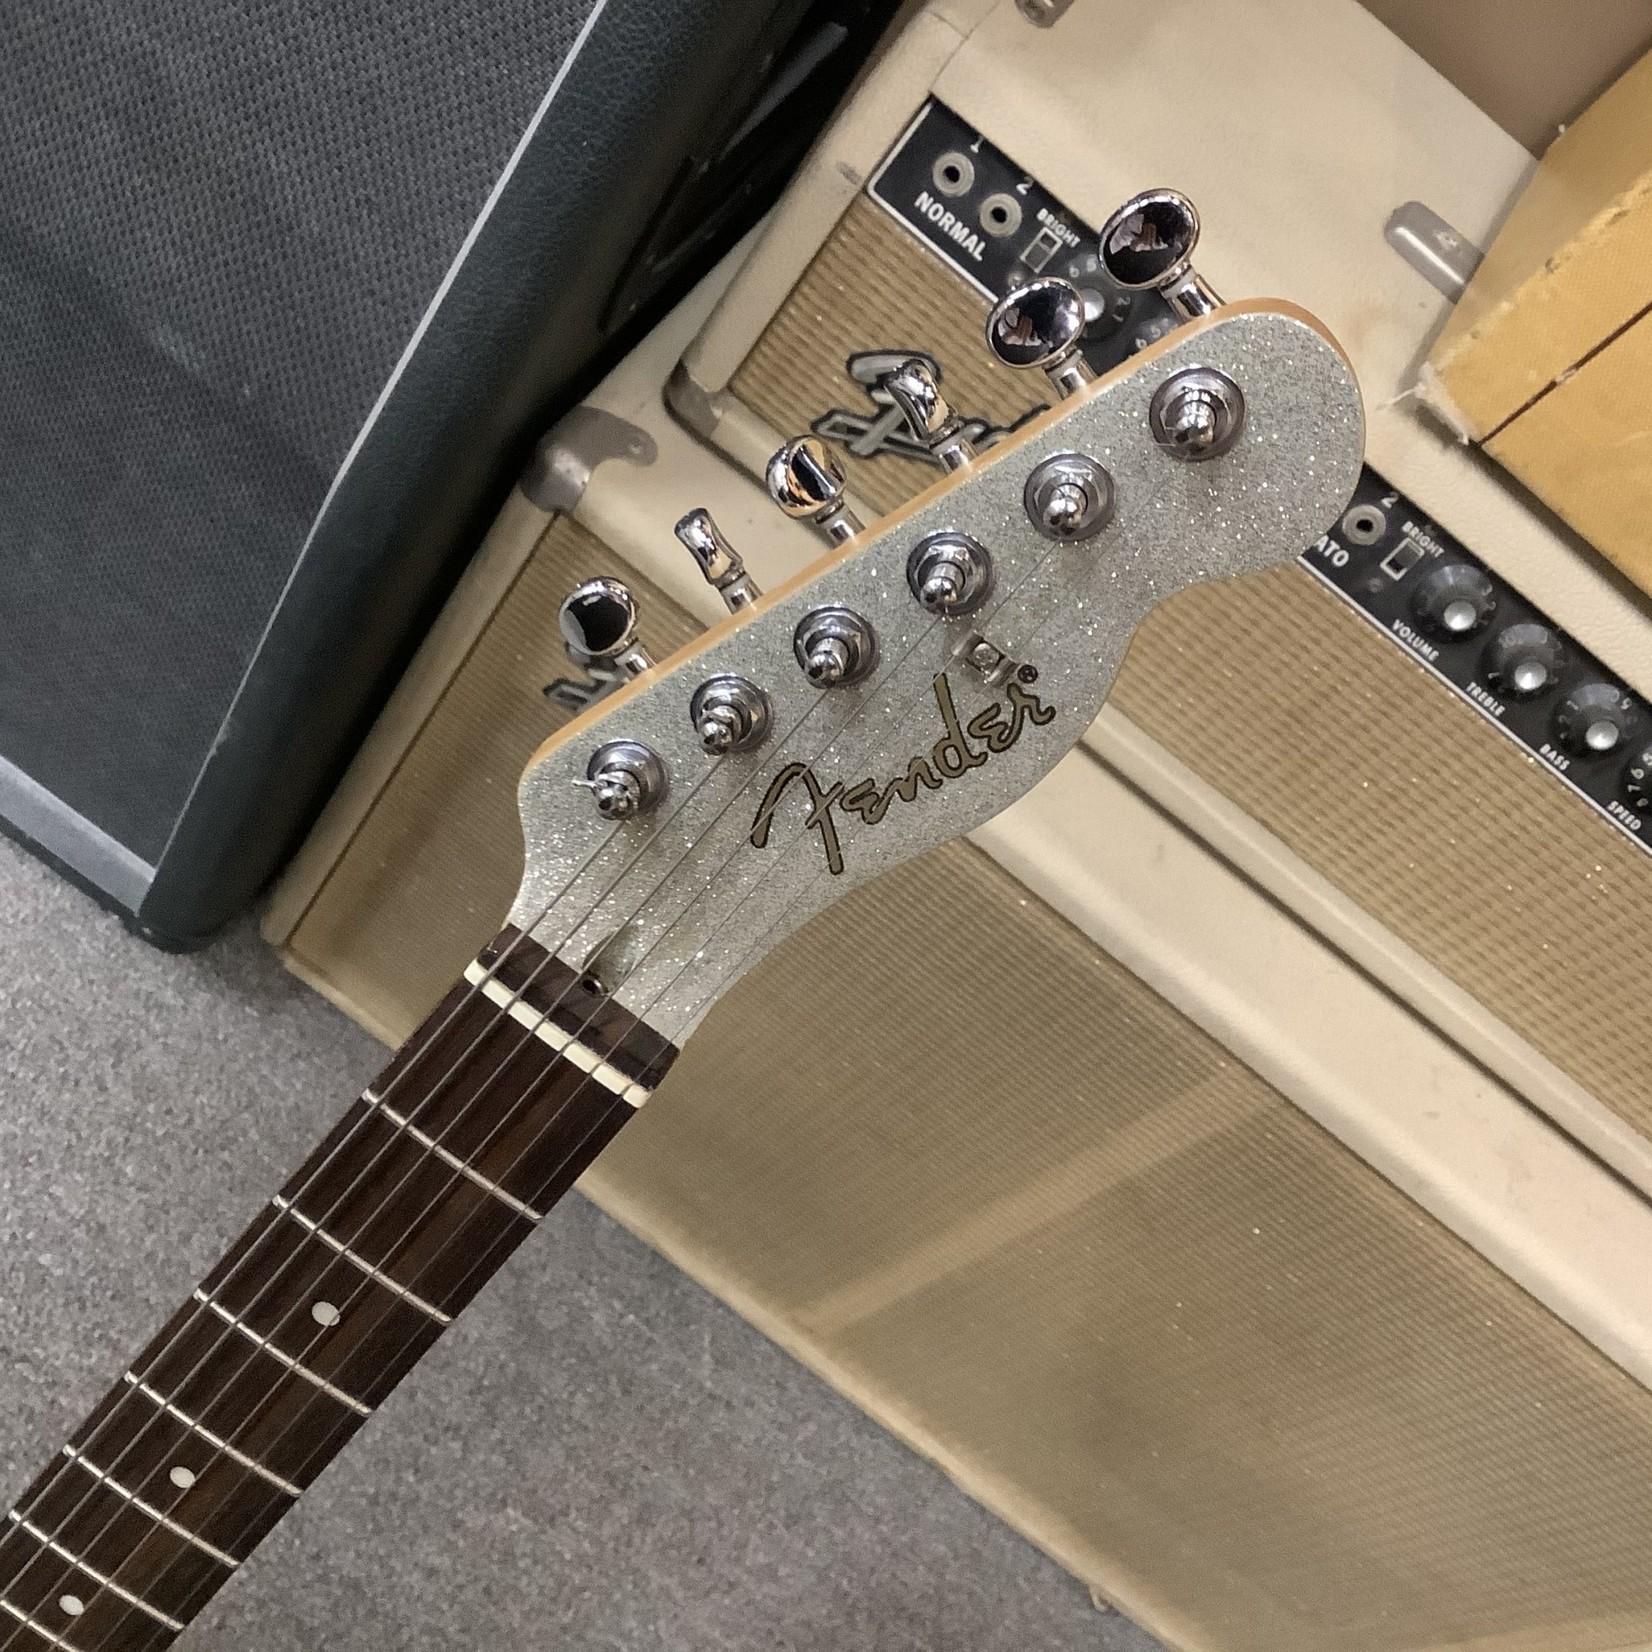 Fender Fender Acoustic Telecaster Sparkle Finish